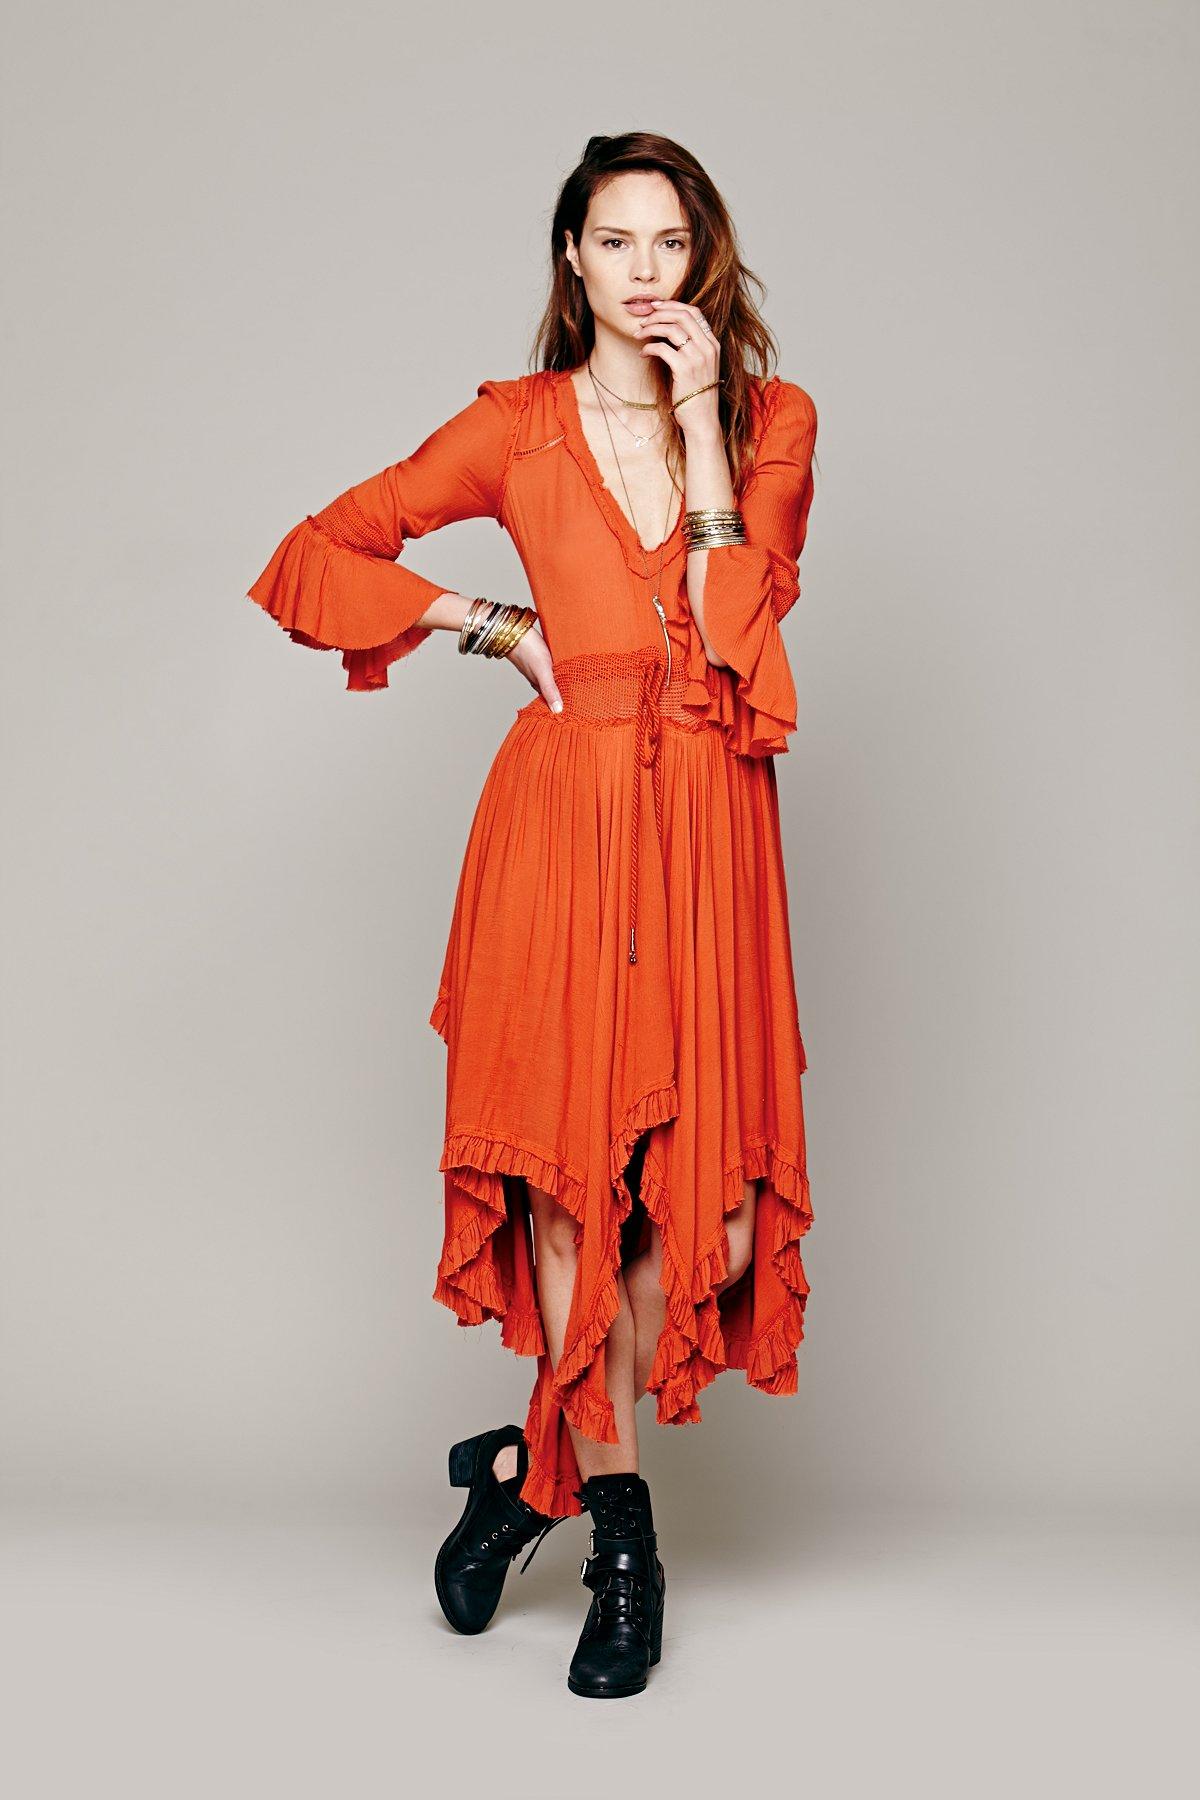 Roomy Ruffle Dress